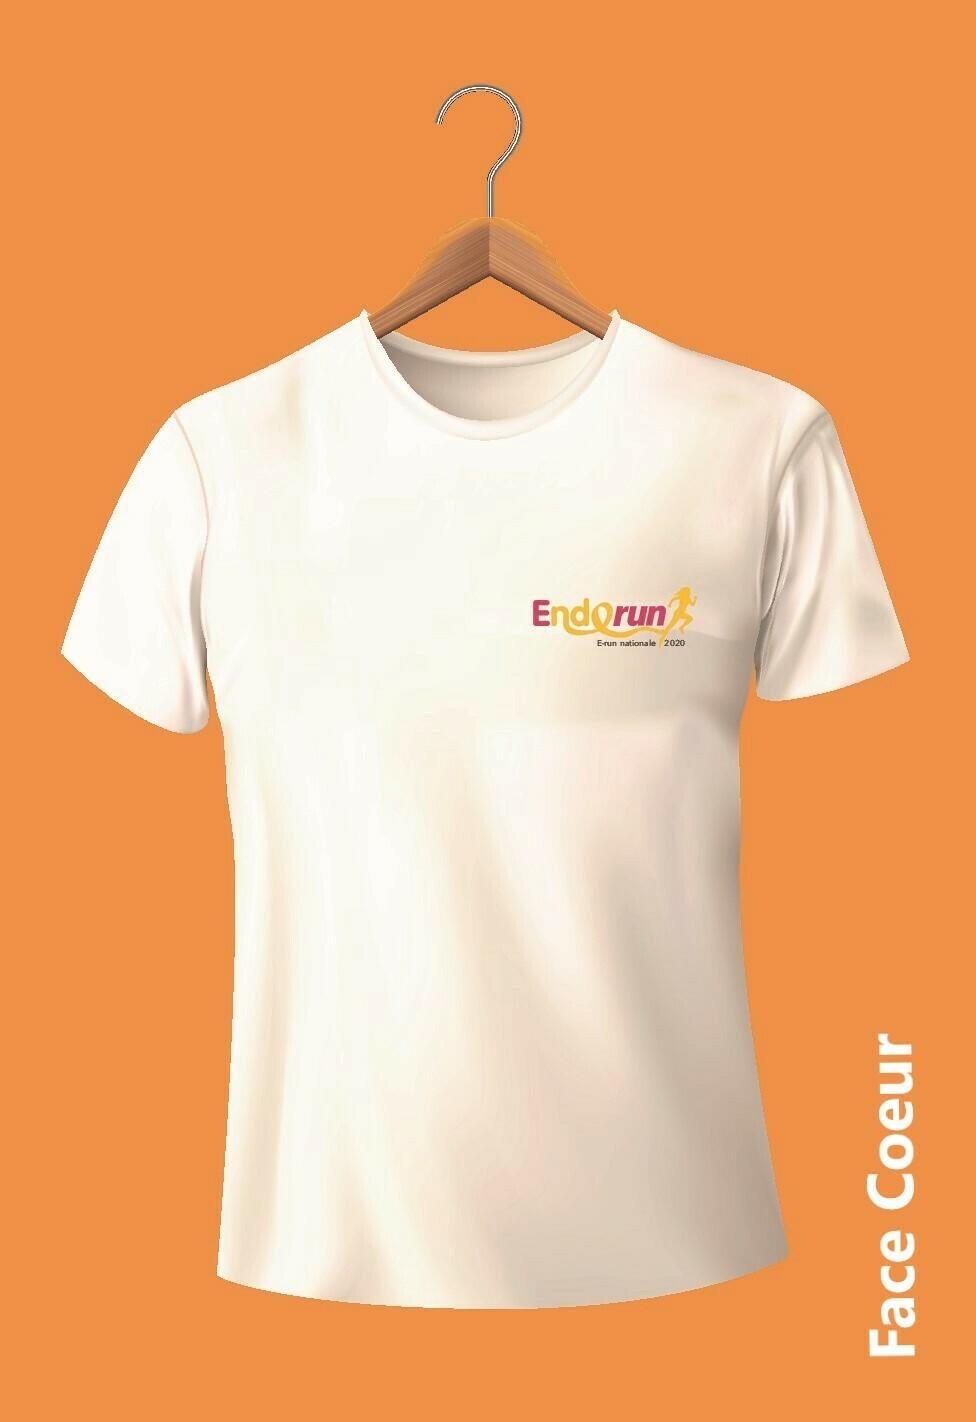 Tee shirt E-Run 2020 Modèle FEMME Taille 2XL *** LIQUIDATION DES STOCKS ***